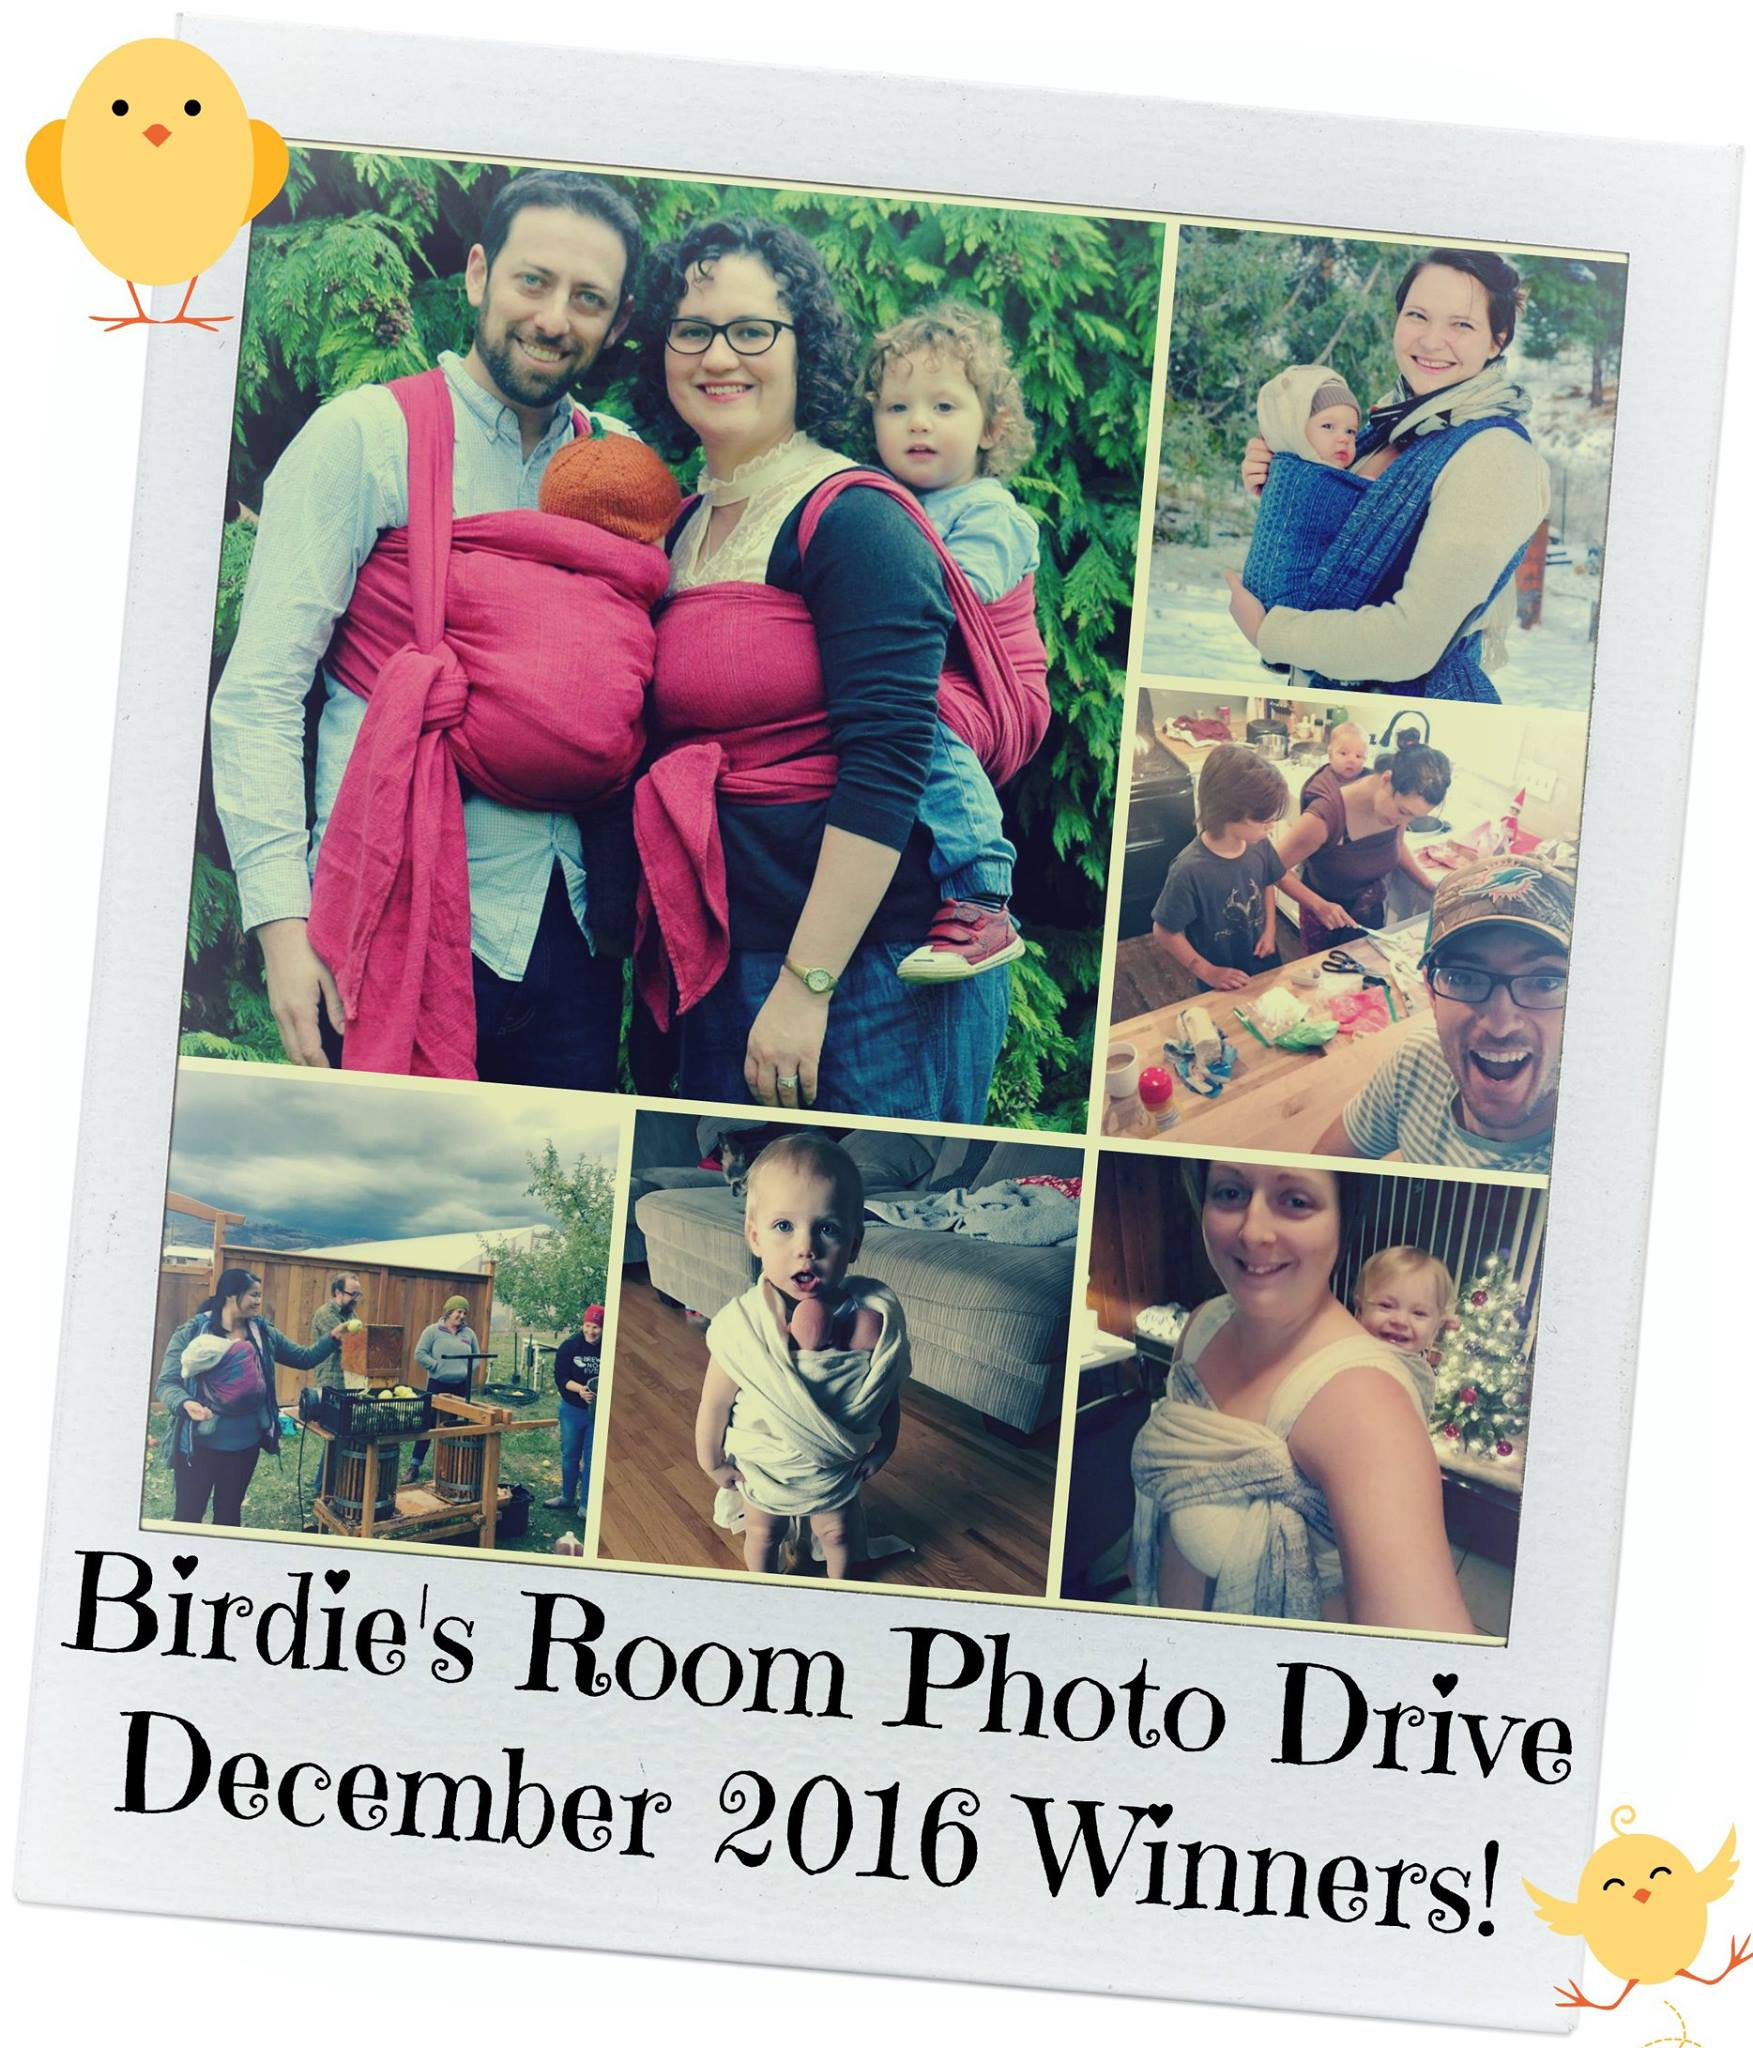 December 2016 Photo Drive